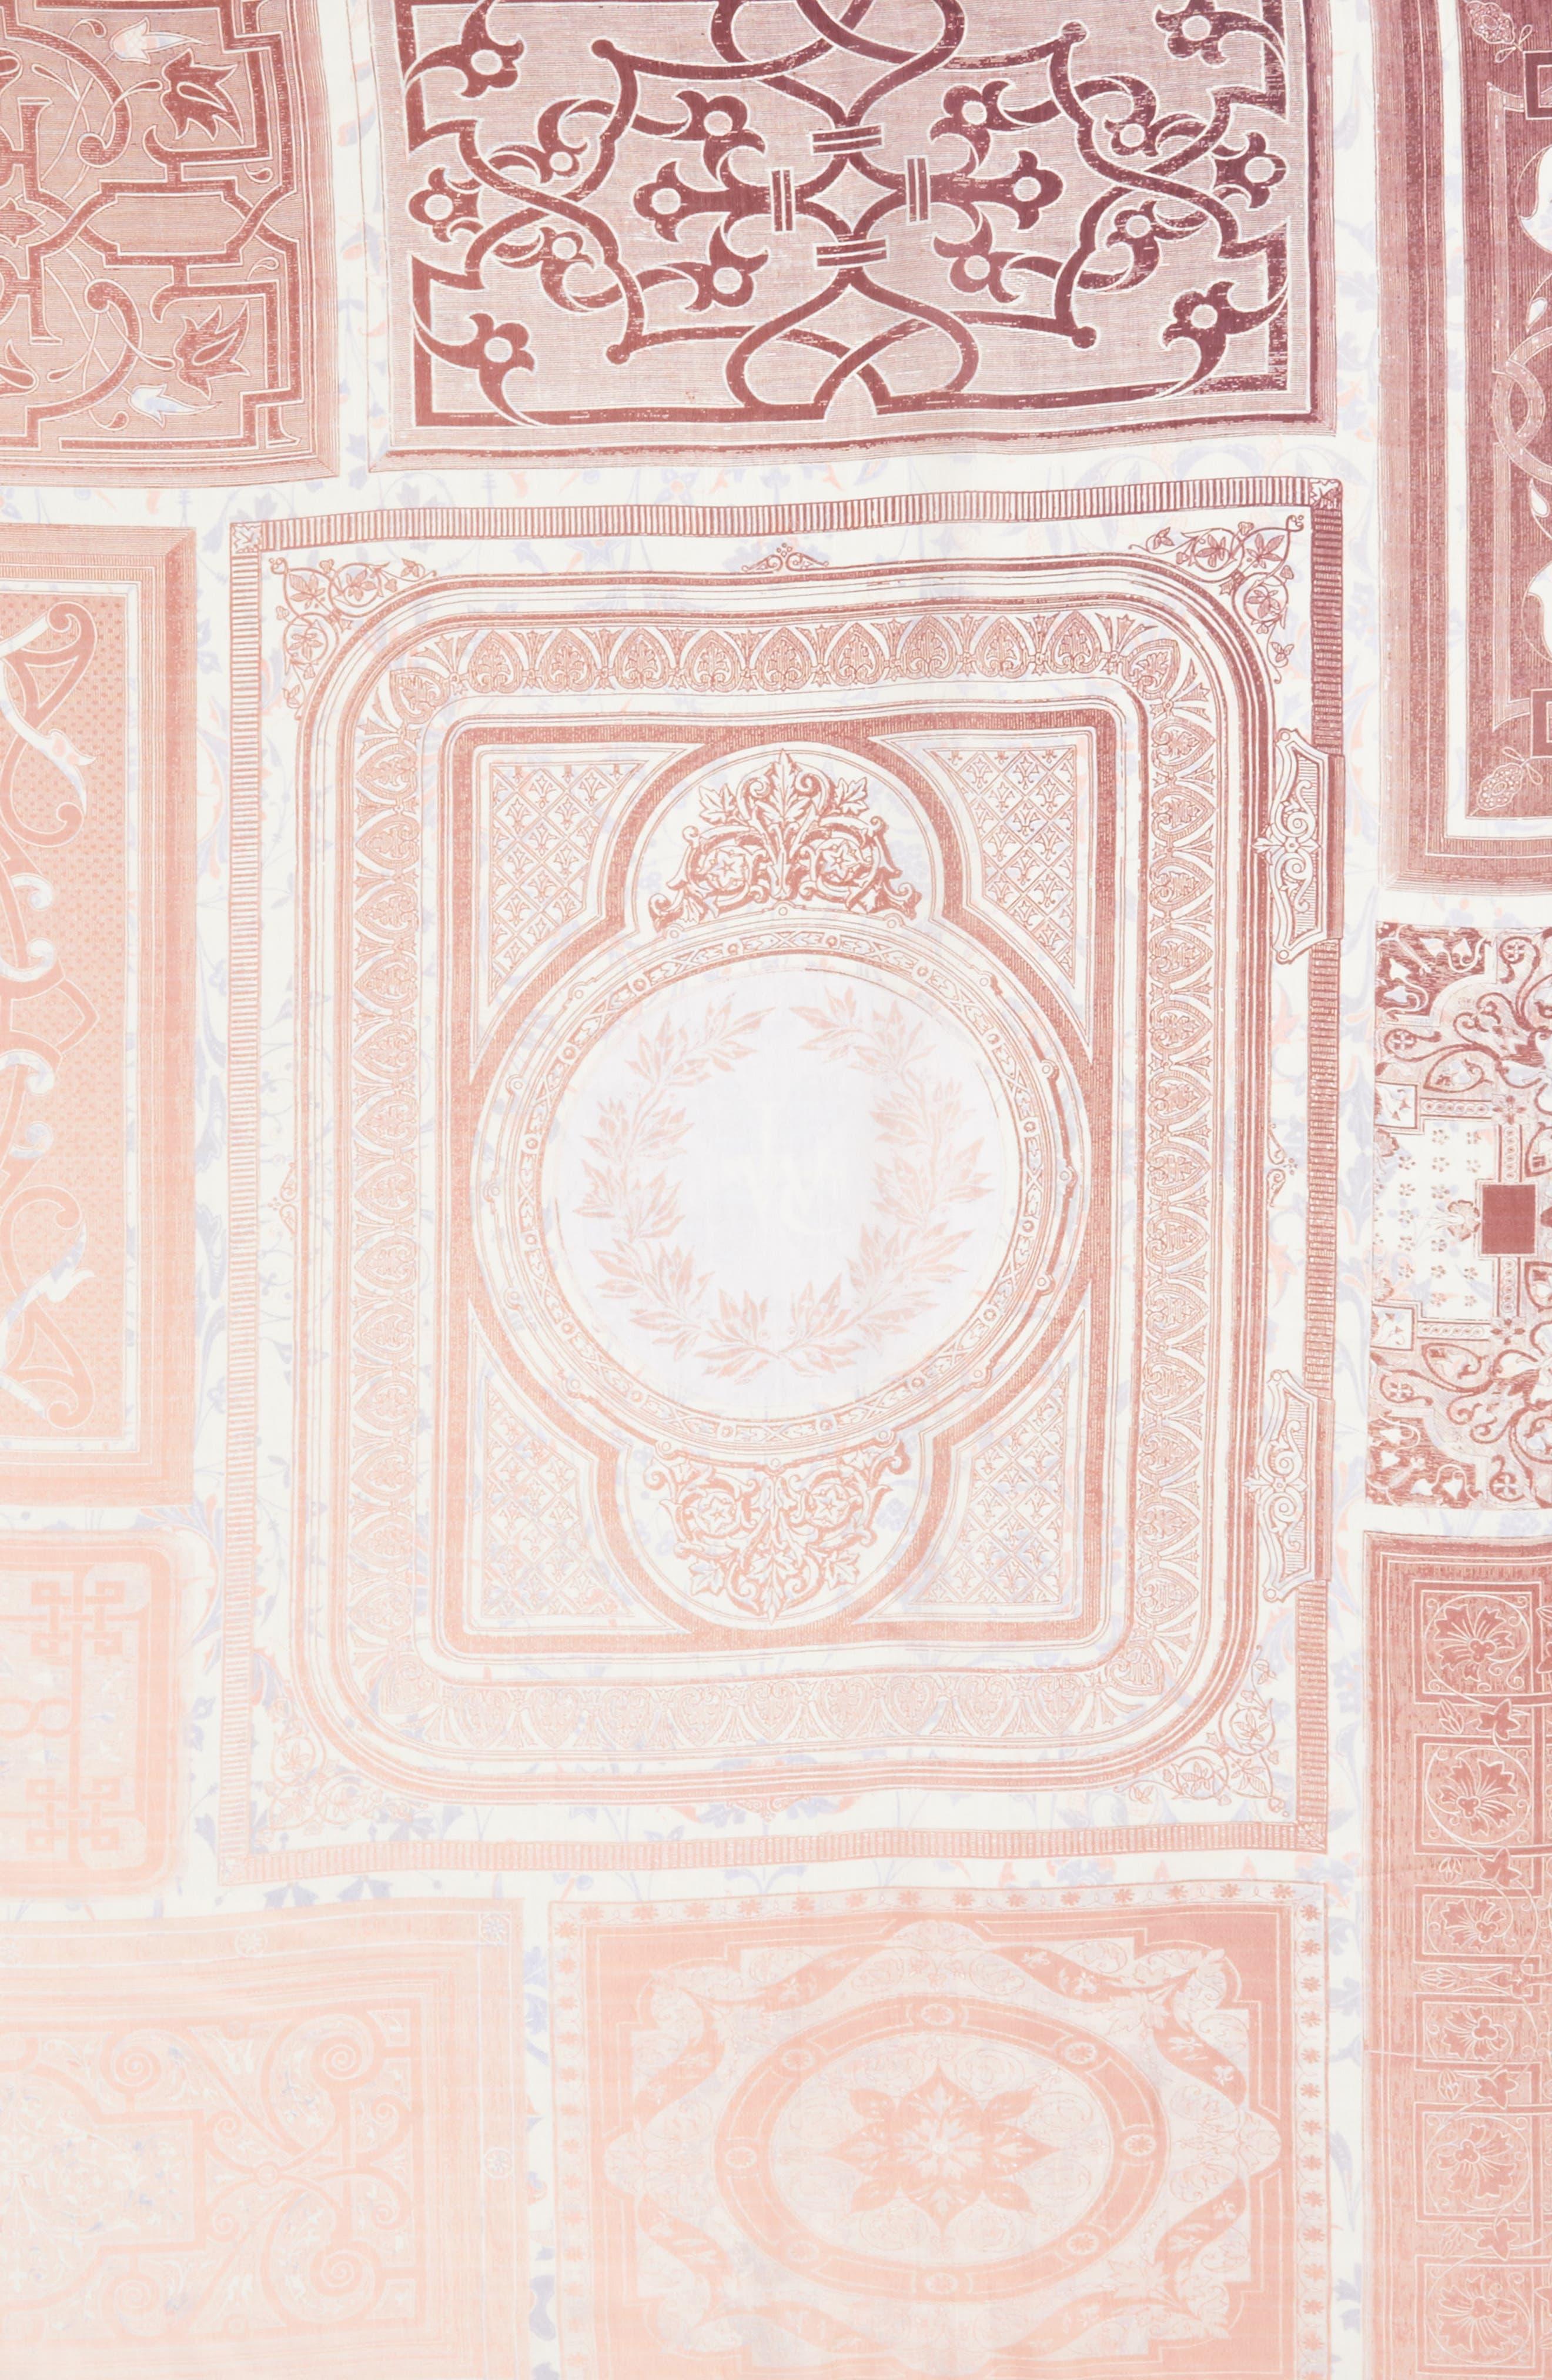 Plate Silk Scarf,                             Alternate thumbnail 3, color,                             250